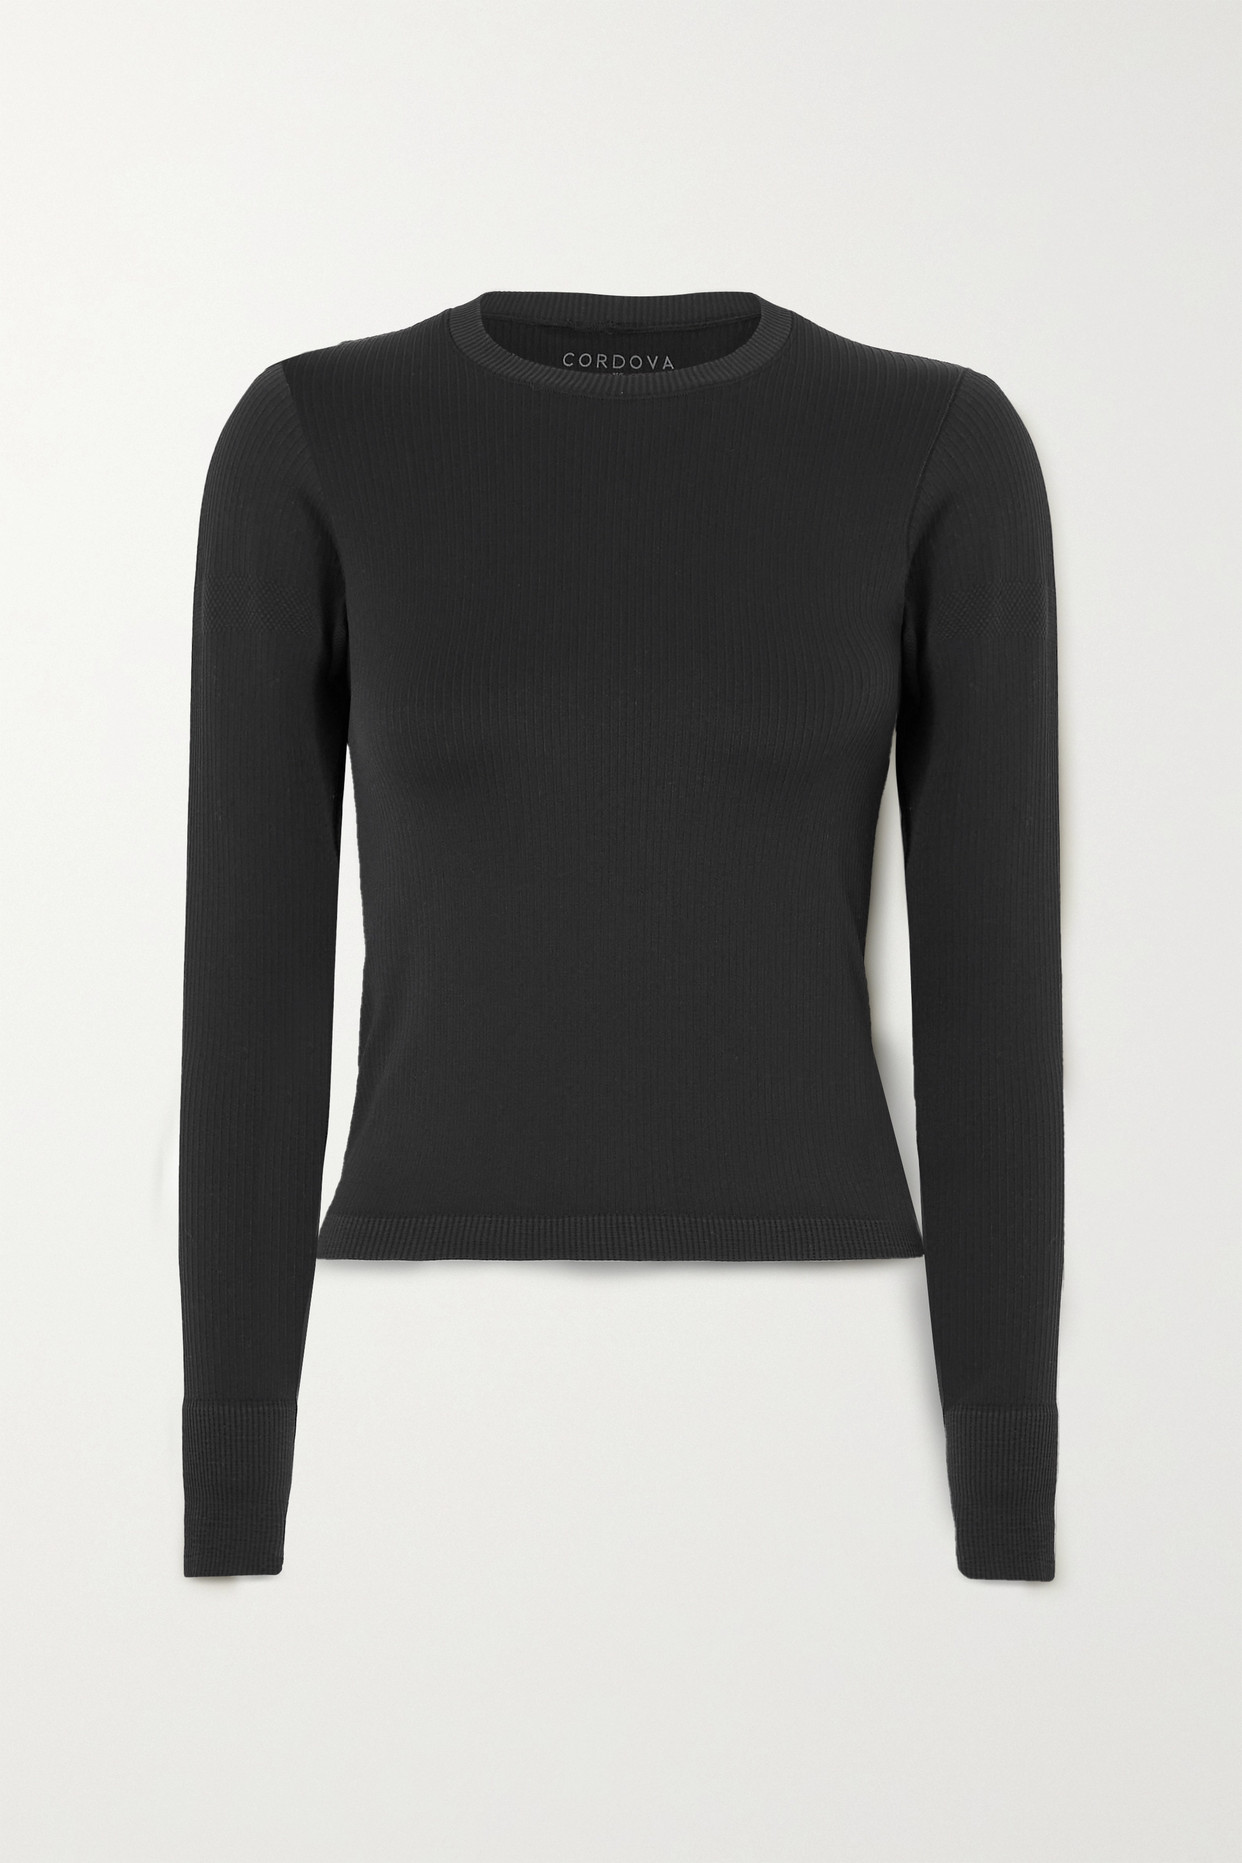 CORDOVA - Signature Ribbed Stretch-knit Top - Black - XS/S